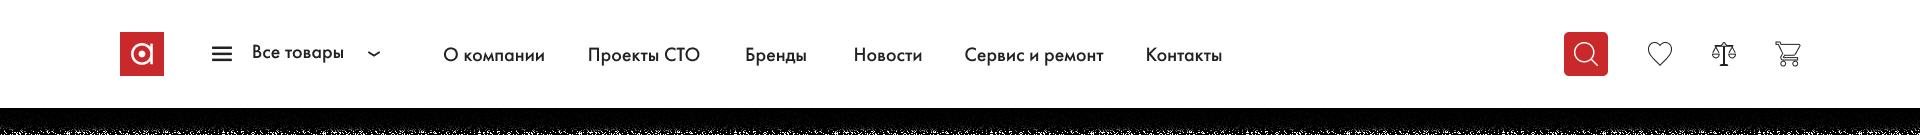 5dab205148cc4667966553.png